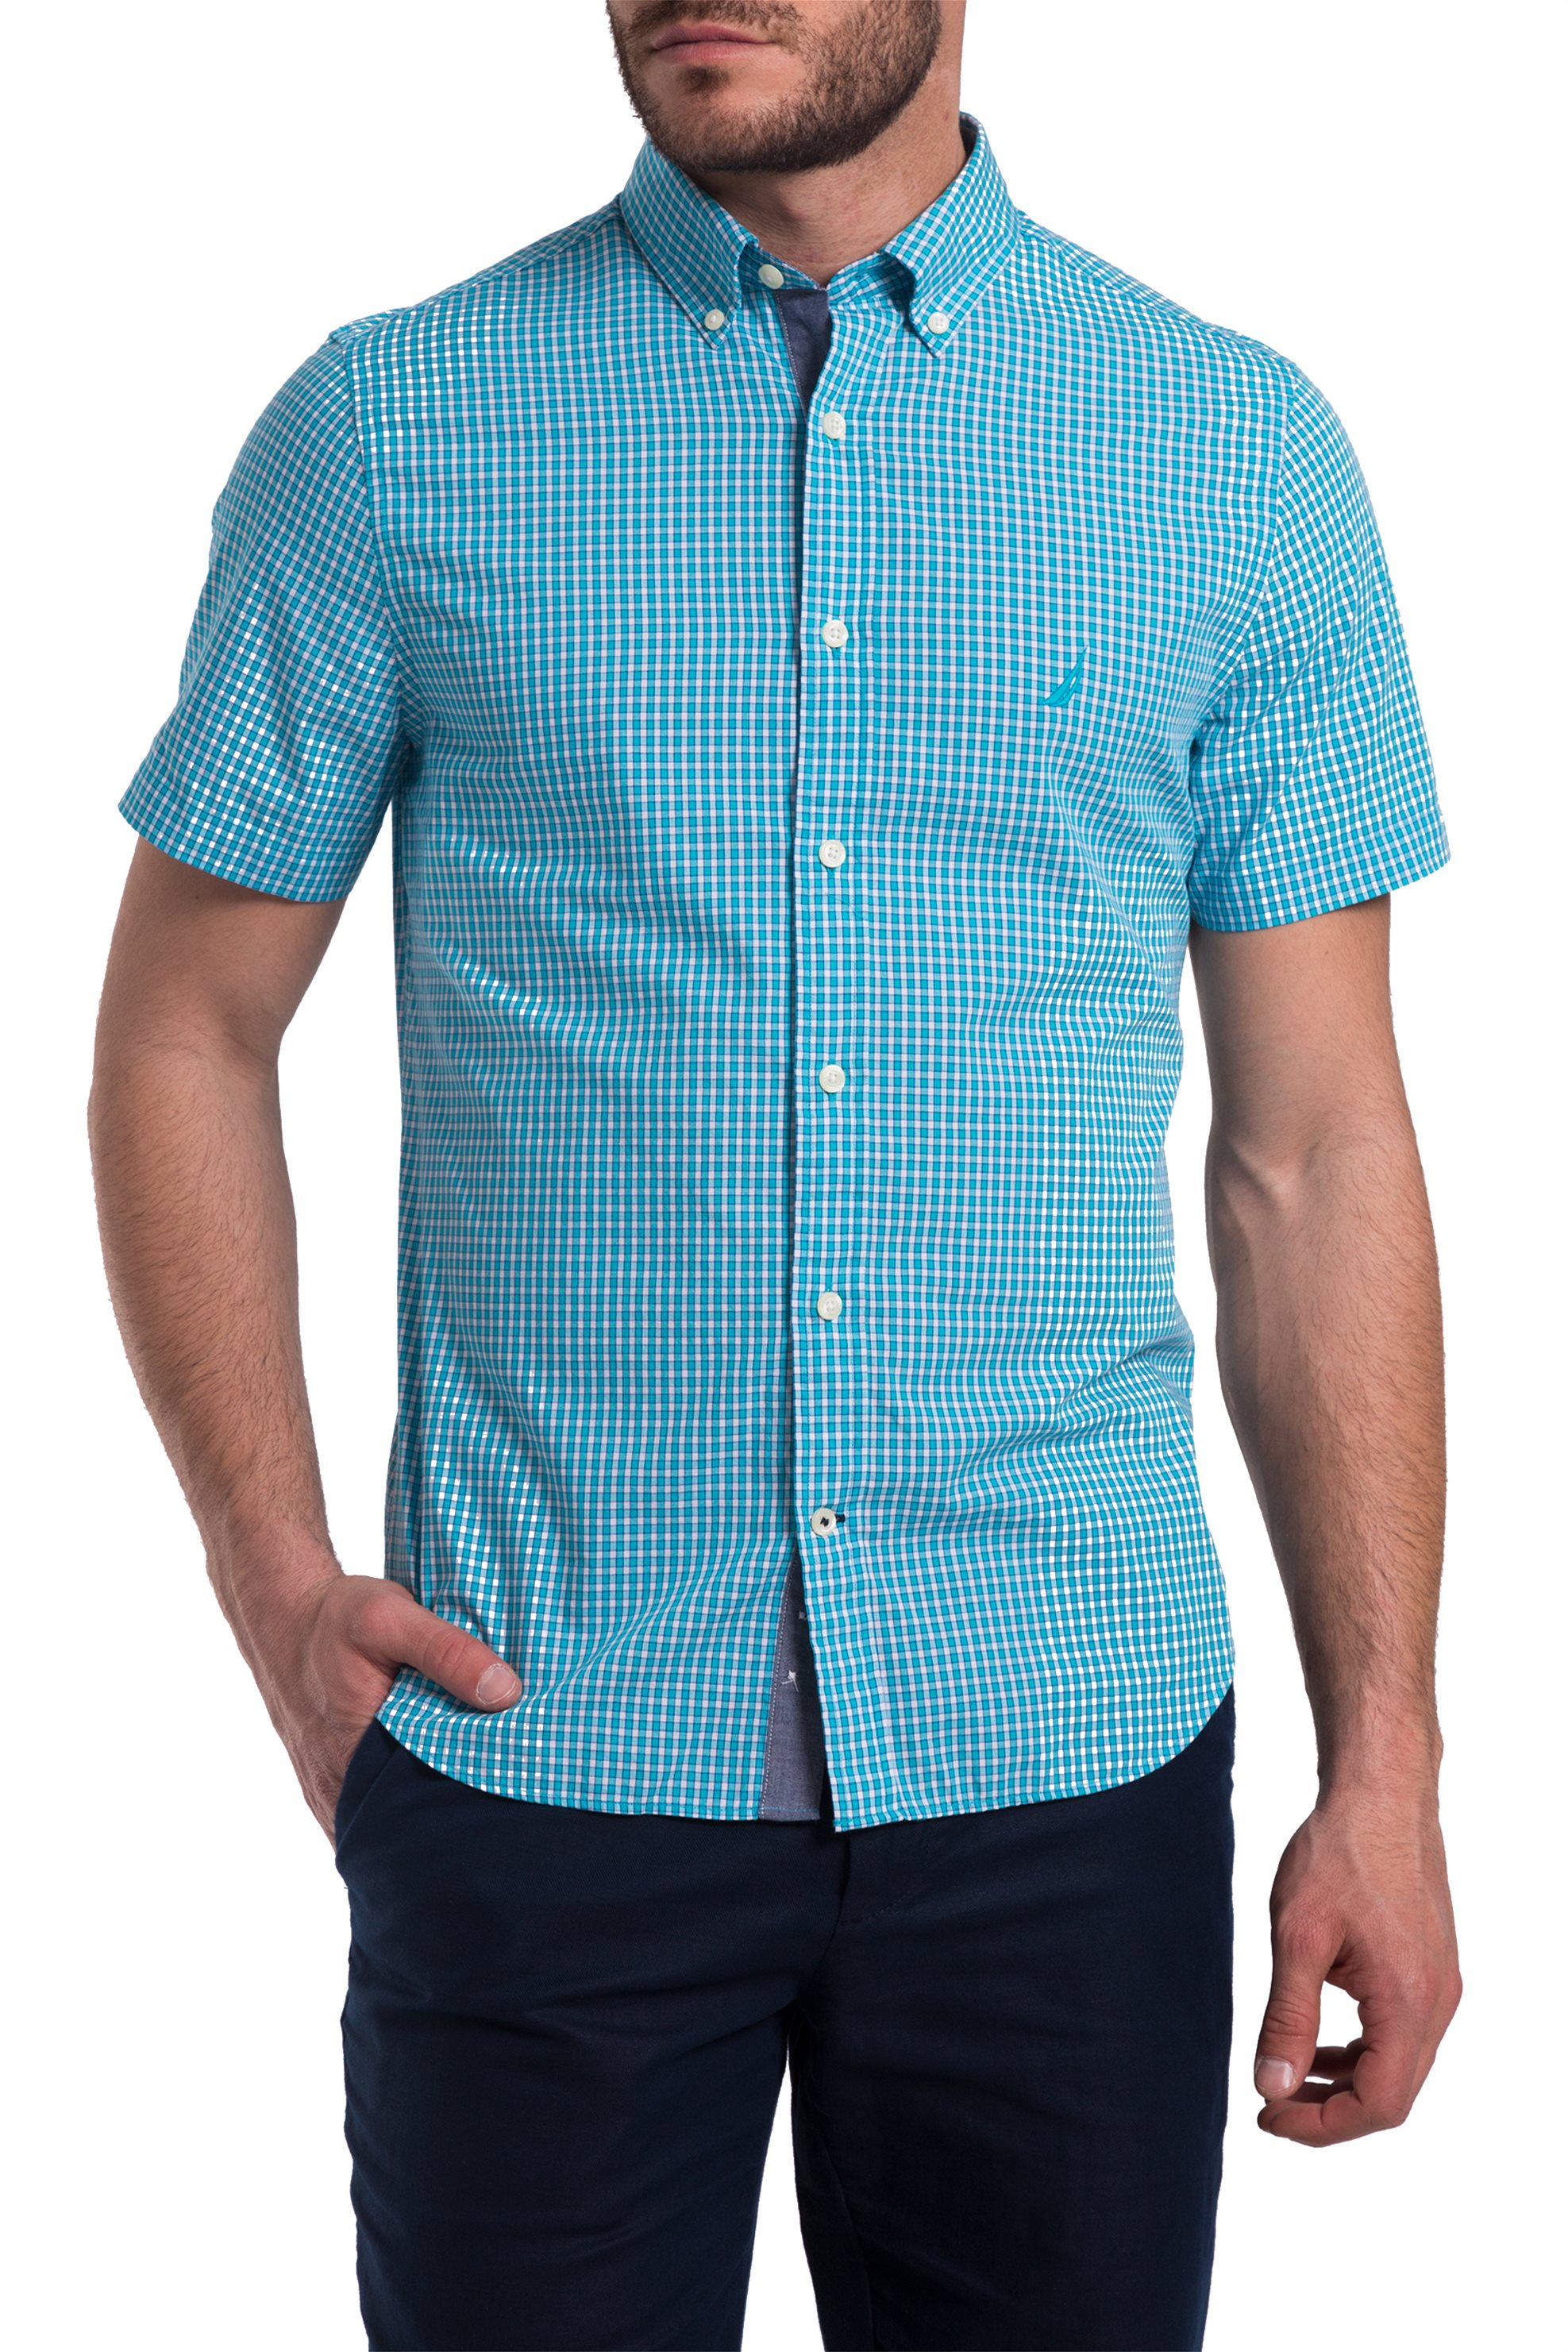 8c0b7182685b Ανδρικό καρό πουκάμισο με κοντά μανίκια Nautica - 81935W - Βεραμάν